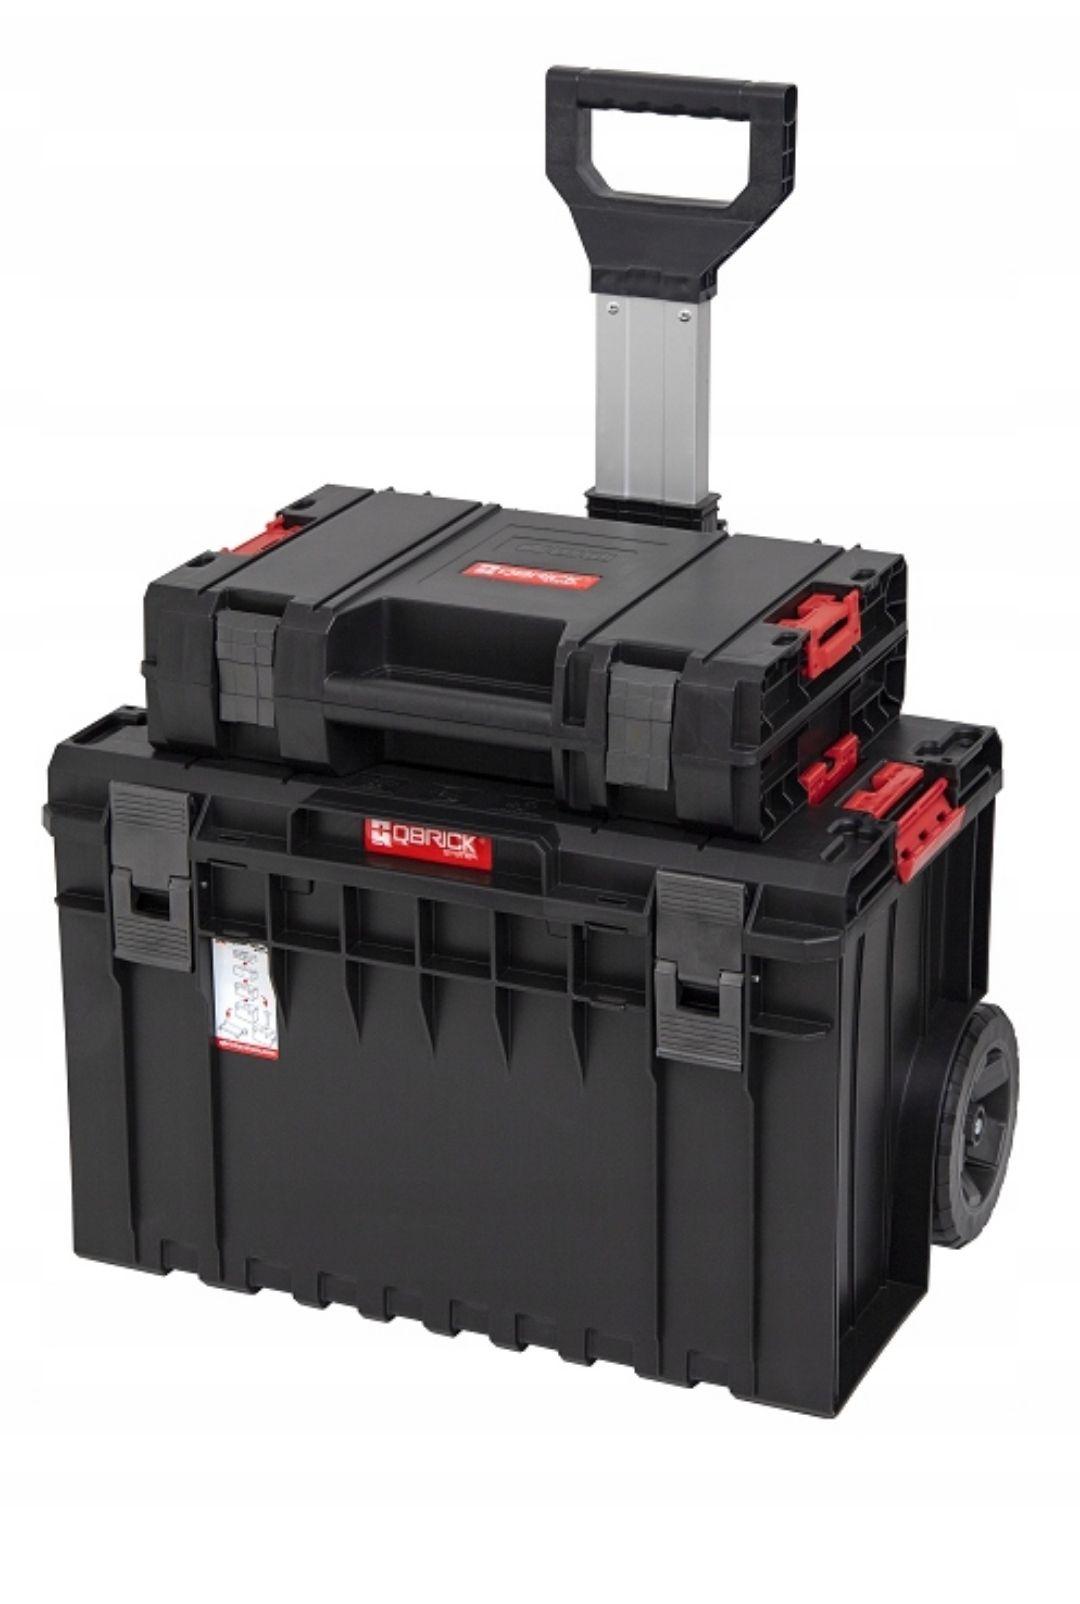 QBRICK One cart plus QBRICK toolcase pro, Allegro dostawa Smart, Zimowa wyprzedaż